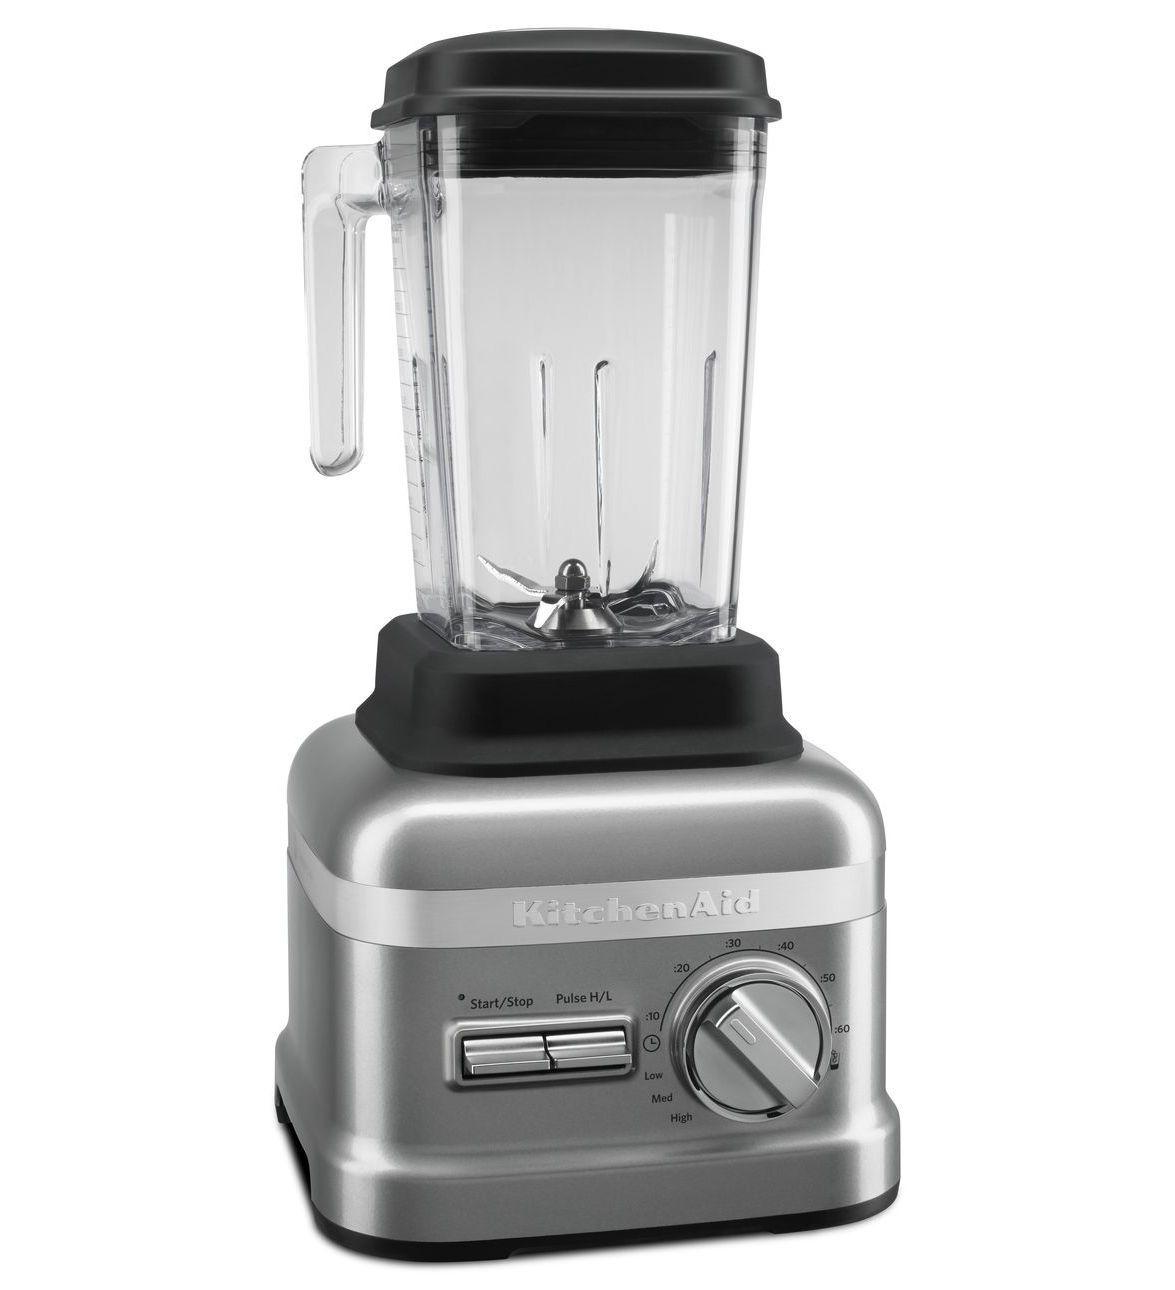 Kitchenaid commercial blender with 35 peak hp motor